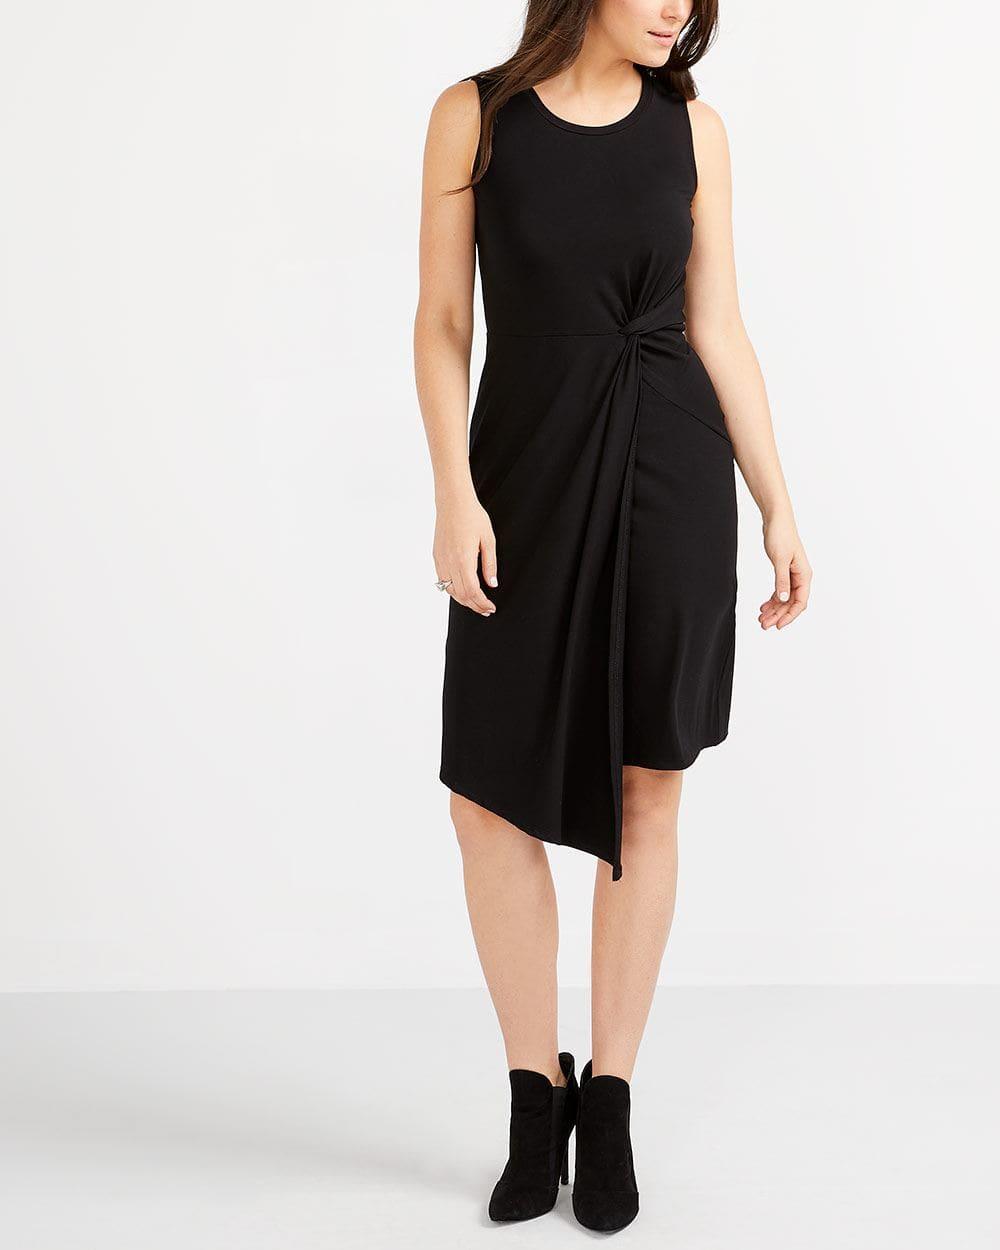 Sleeveless Front Knot Dress